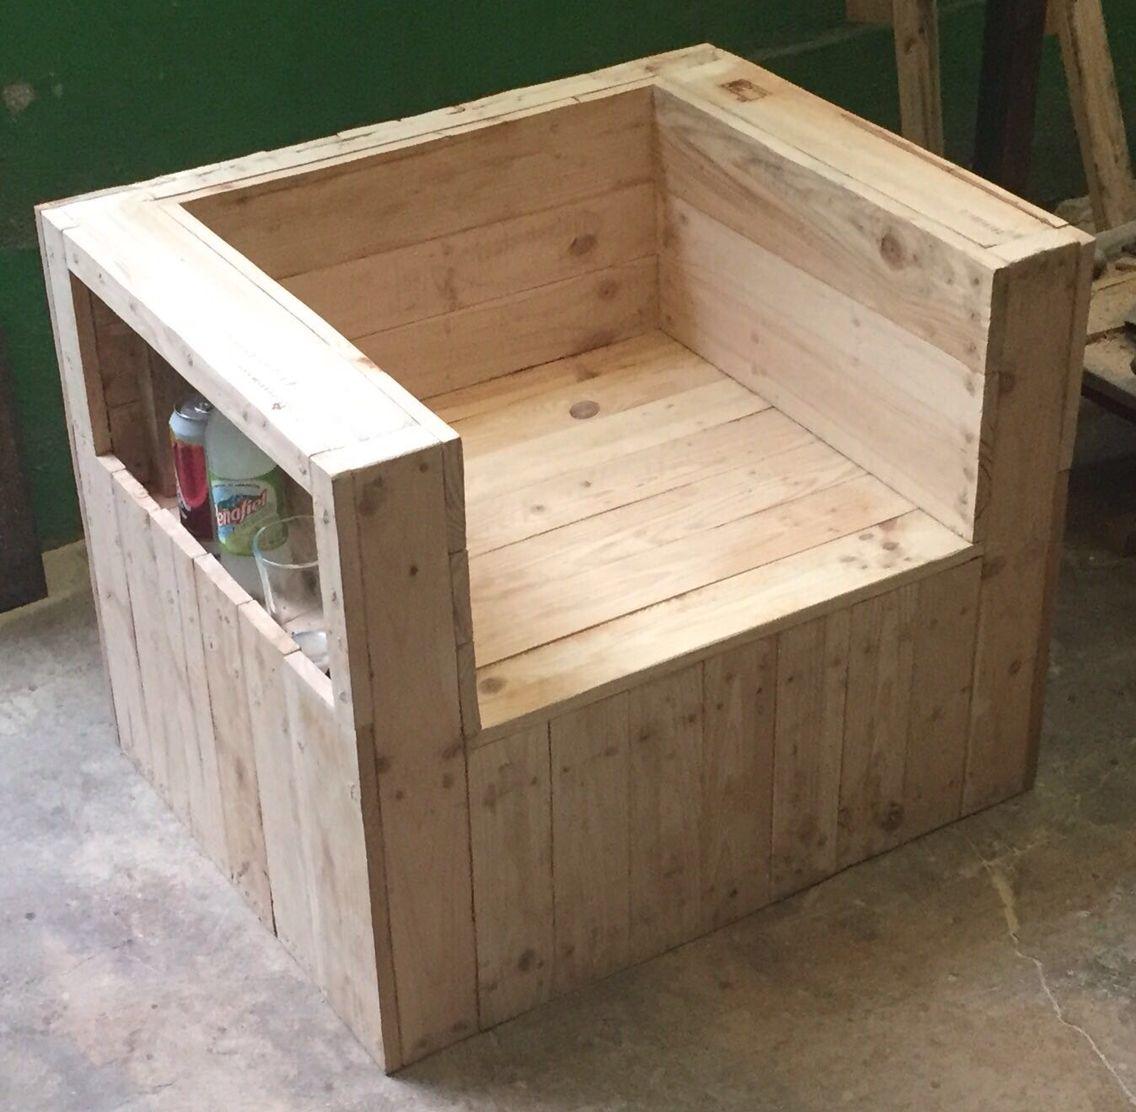 Sill n individual hecho de madera de tarima sill n for Sillones de madera reciclada